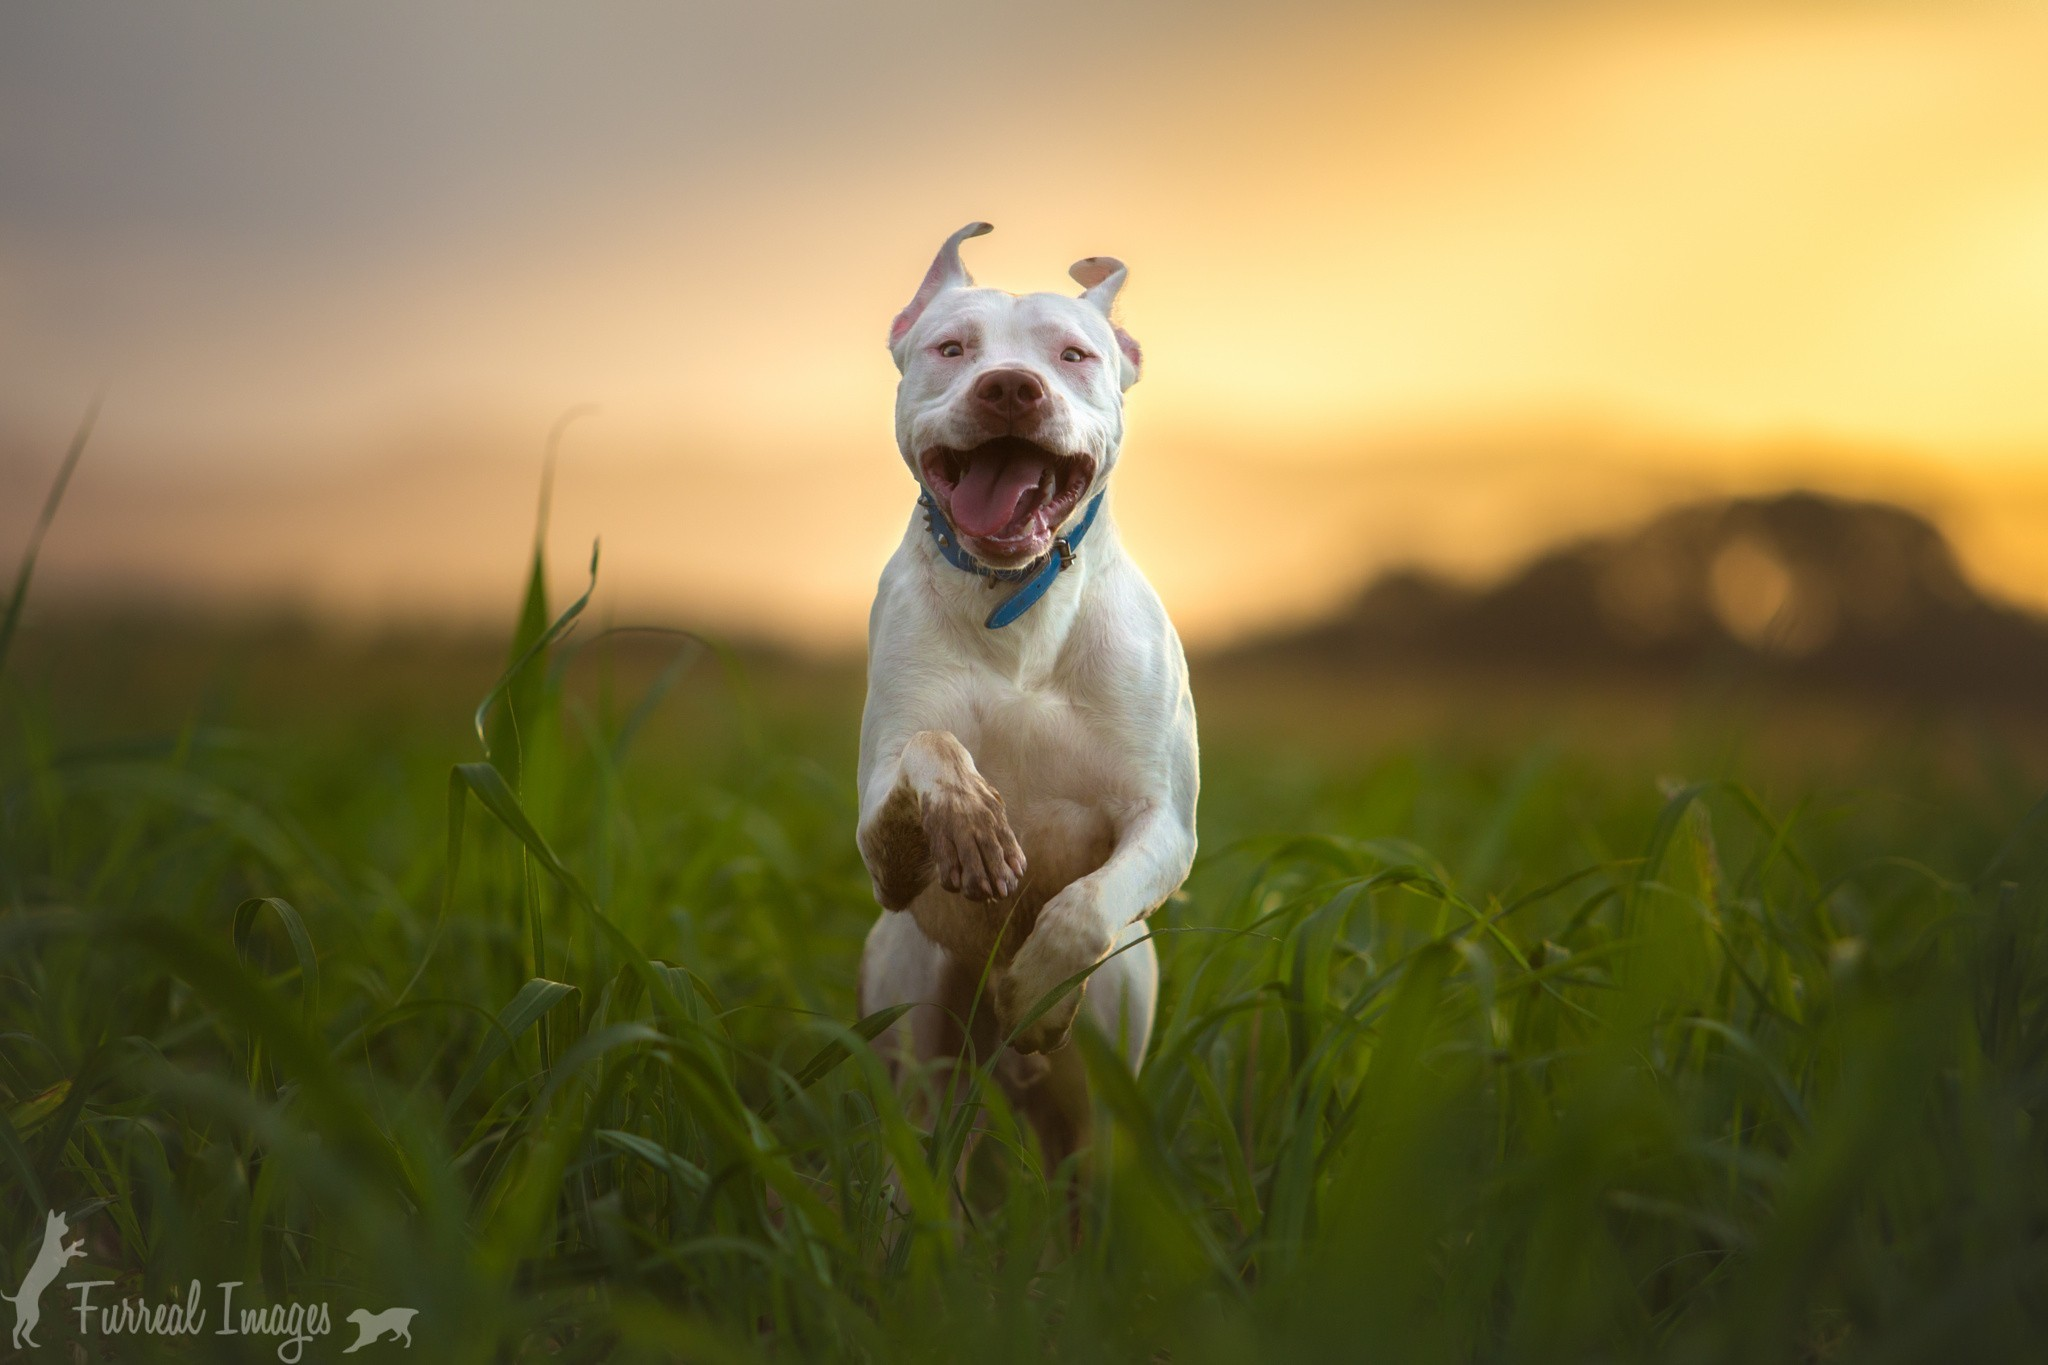 Cute Puppy Live Wallpaper Pitbull Dog Wallpaper 183 ① Wallpapertag